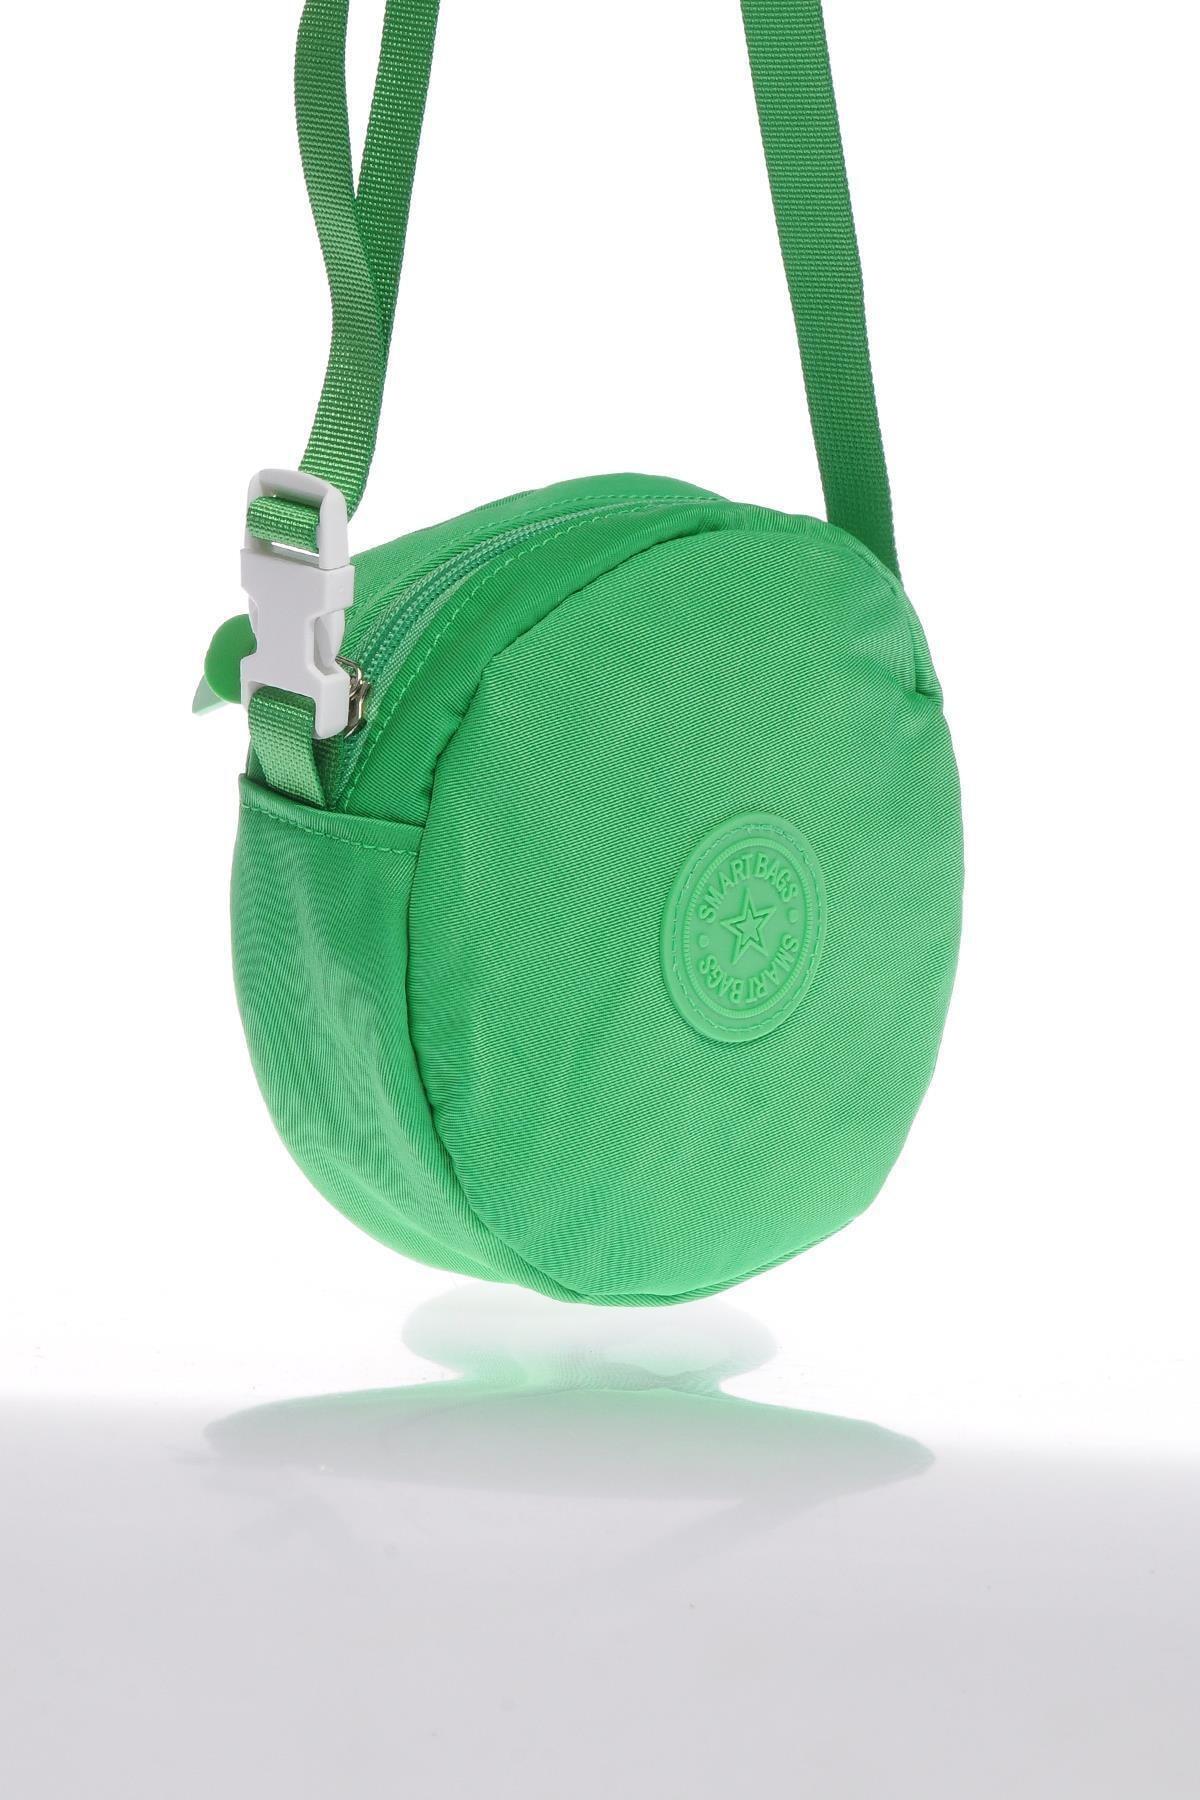 SMART BAGS Smb6001-0069 Yeşil Kadın Minik Çapraz Çanta 2